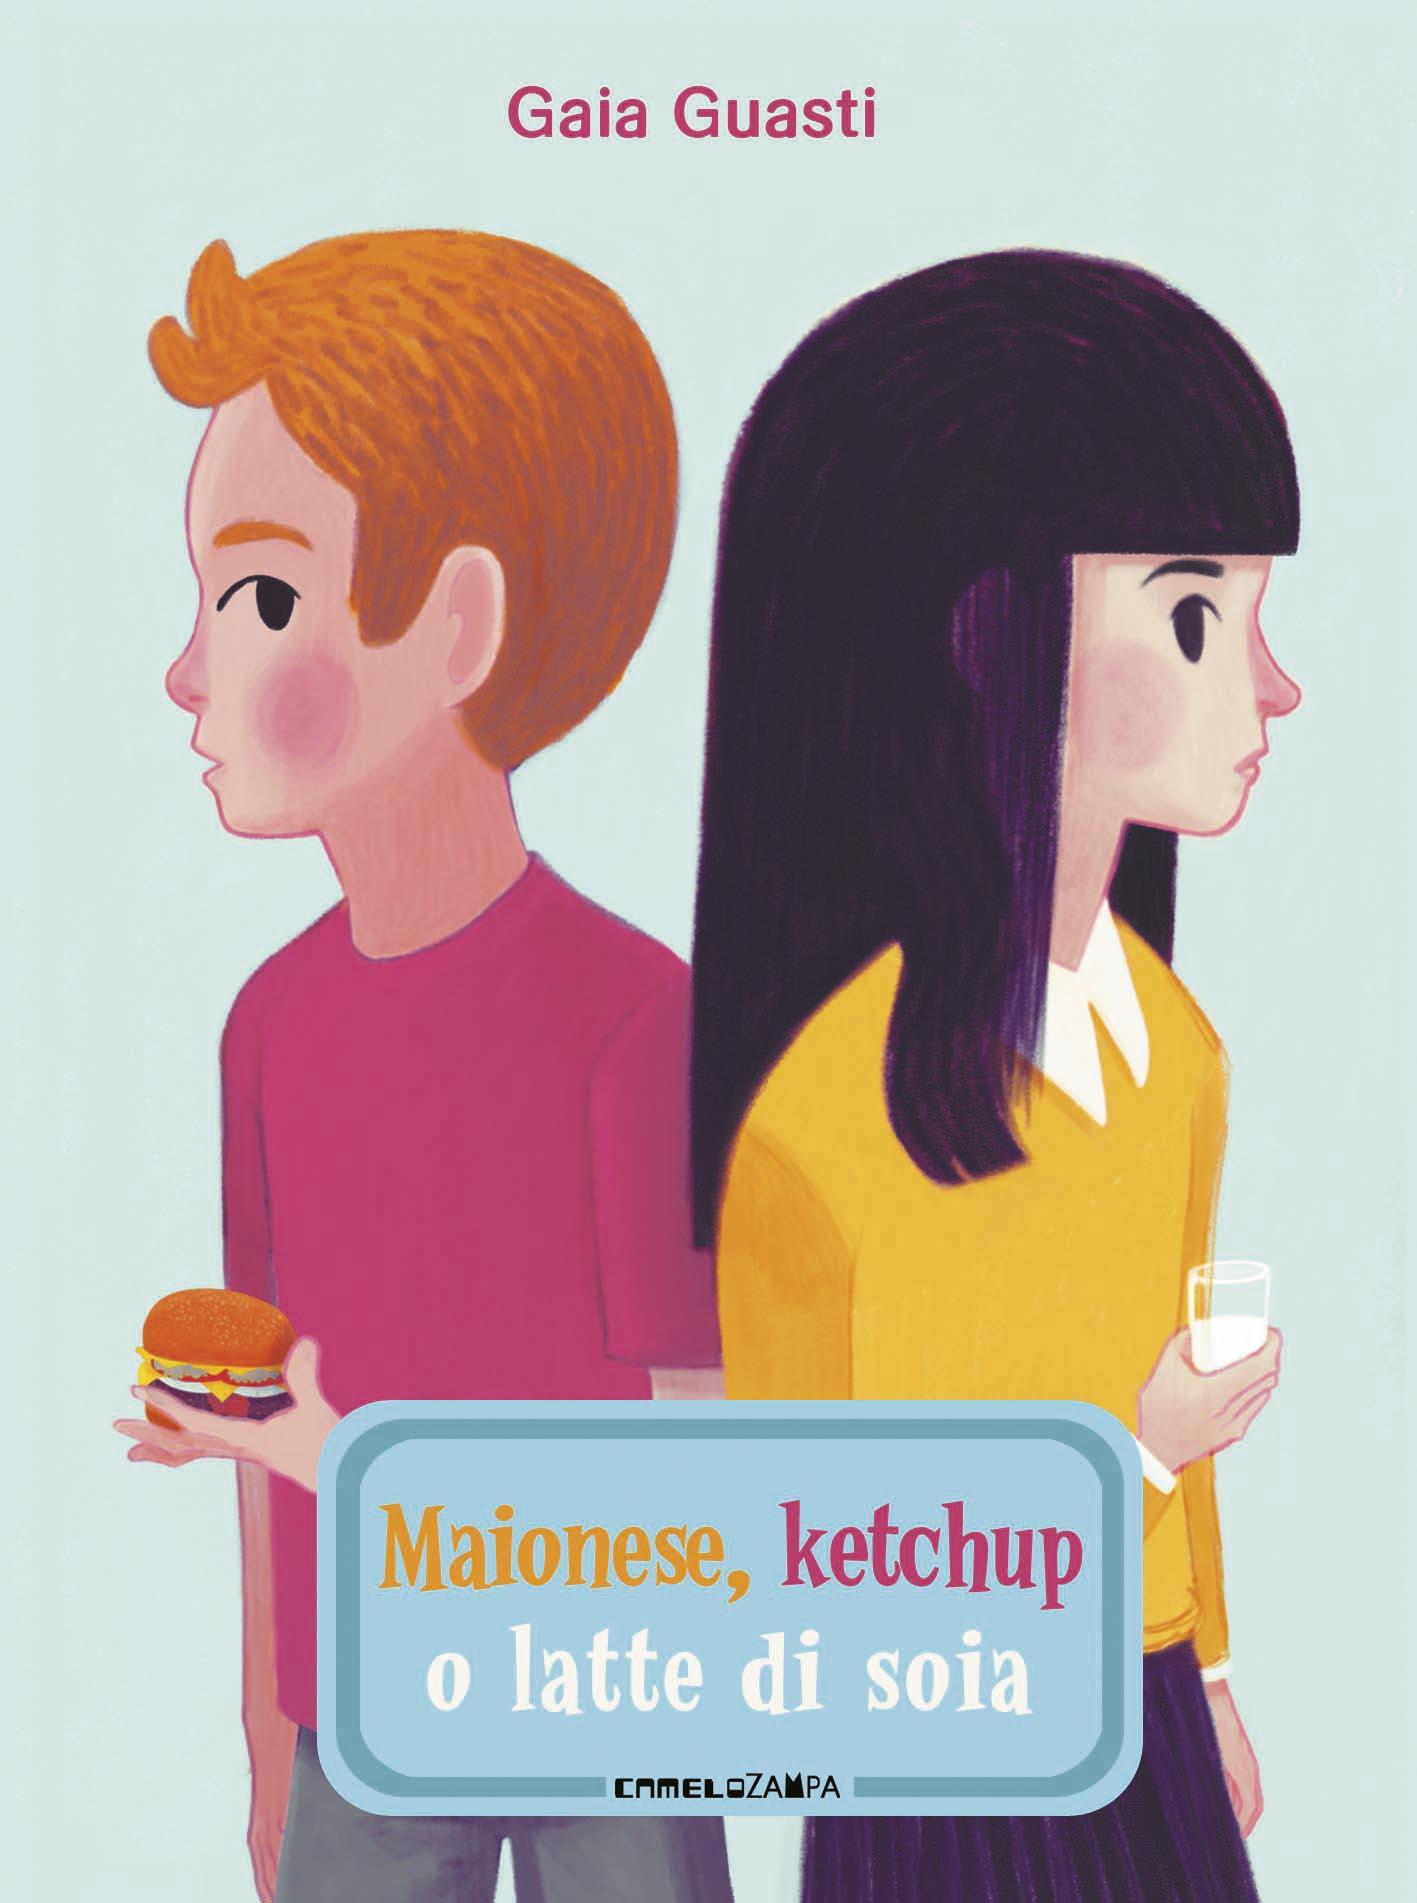 maionese ketchup o latte di soia